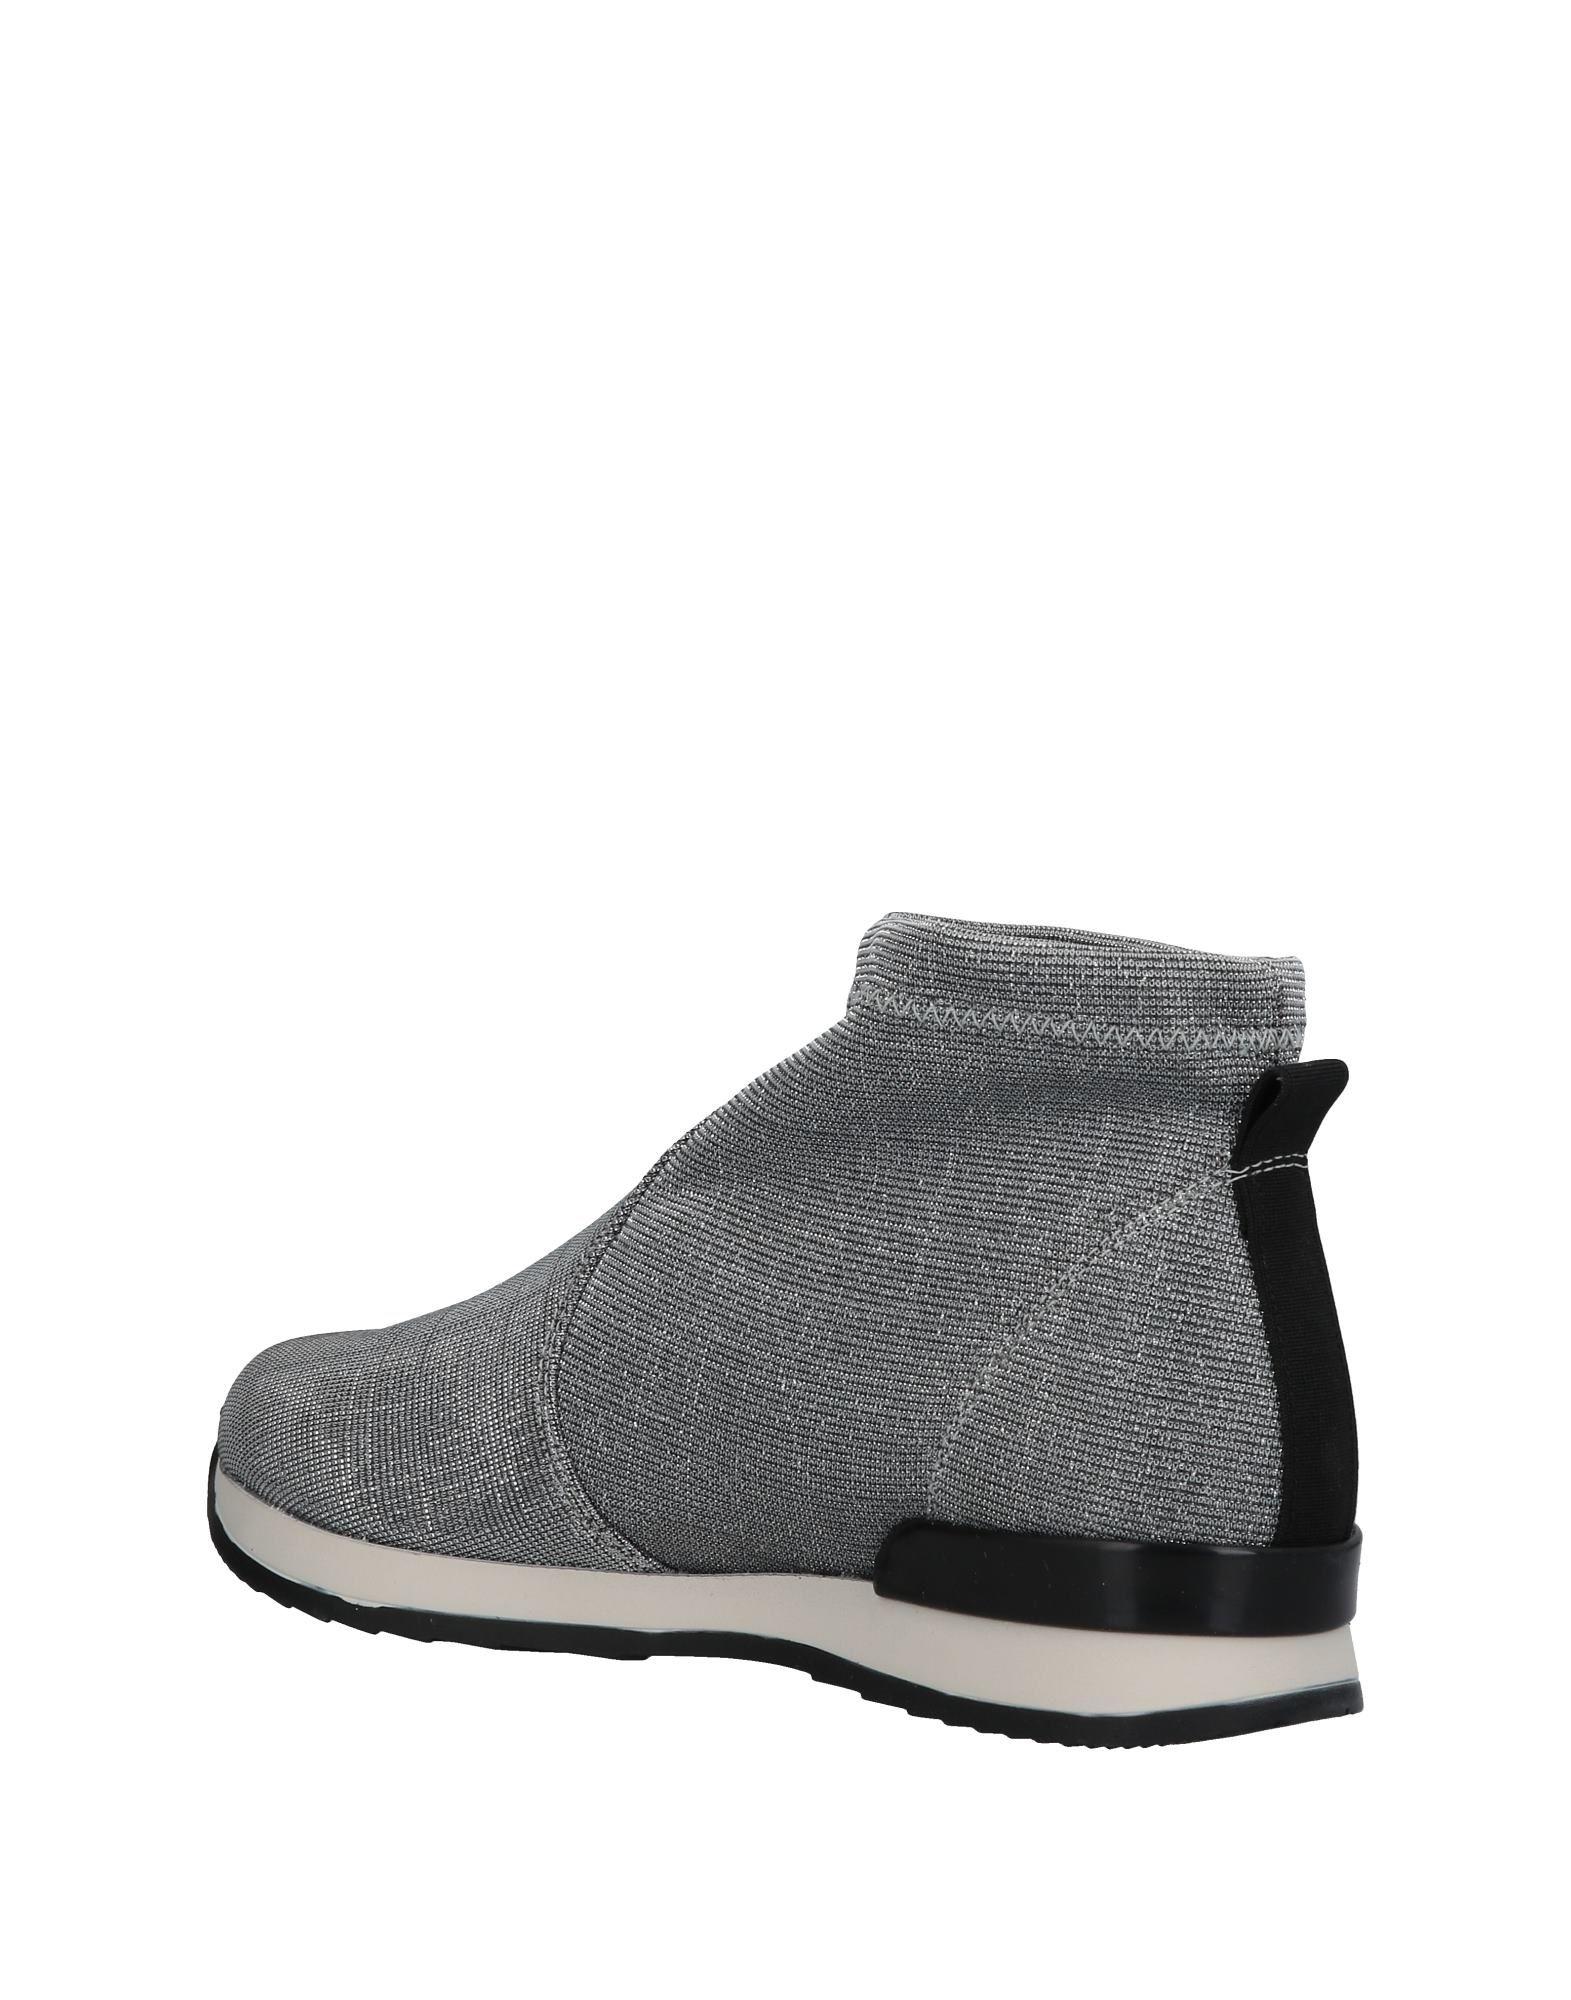 Nr Rapisardi Sneakers Damen  11419252BW Gute Qualität beliebte Schuhe Schuhe Schuhe edcb74